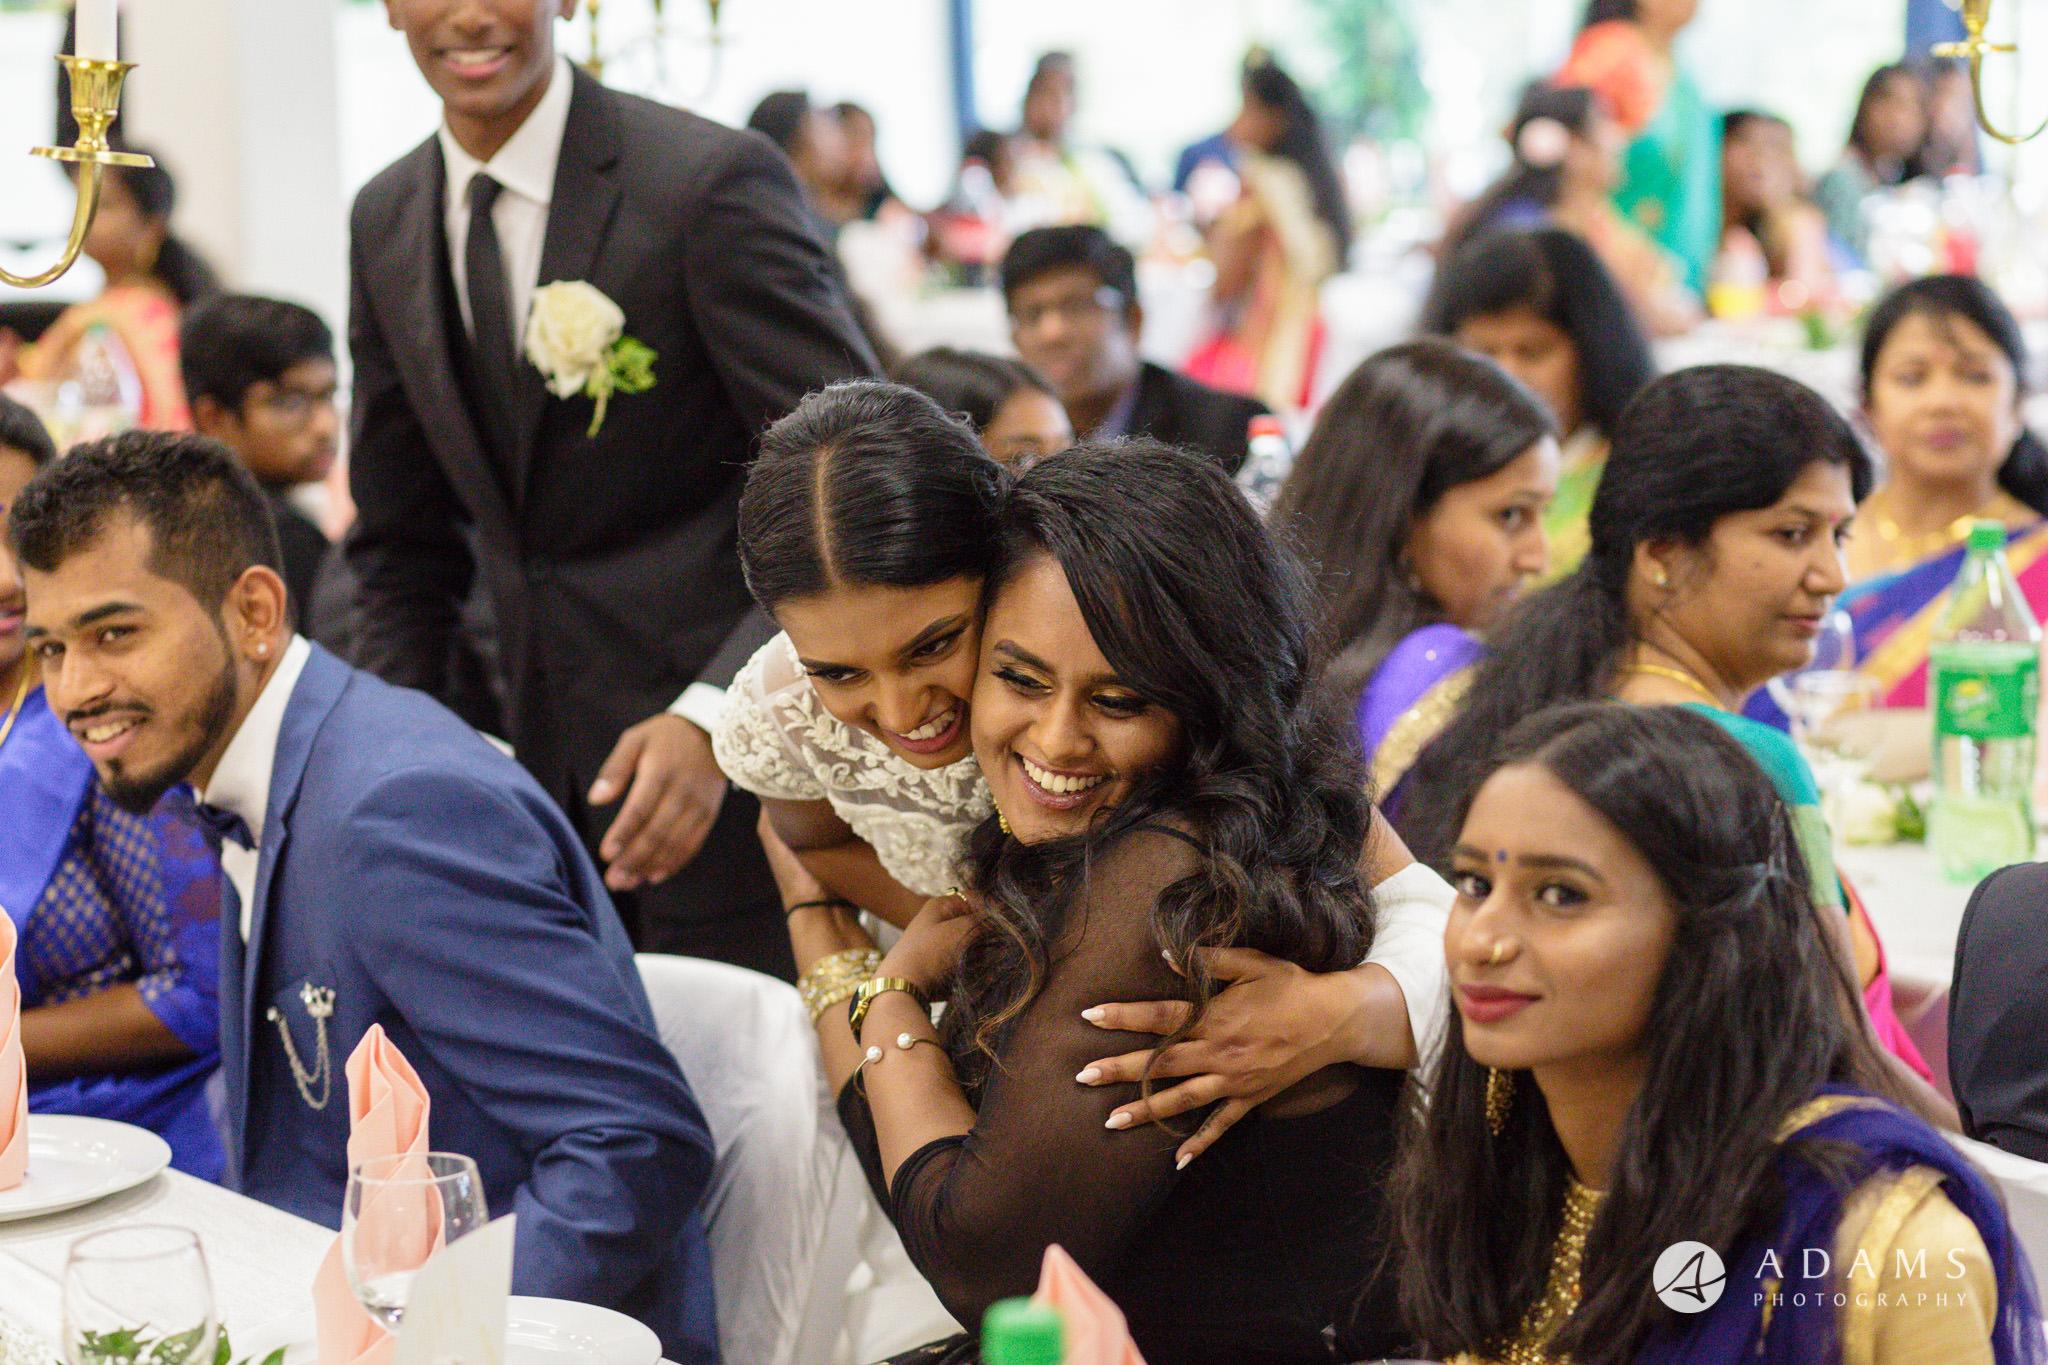 Norway Tamil Wedding guests hugging the bride